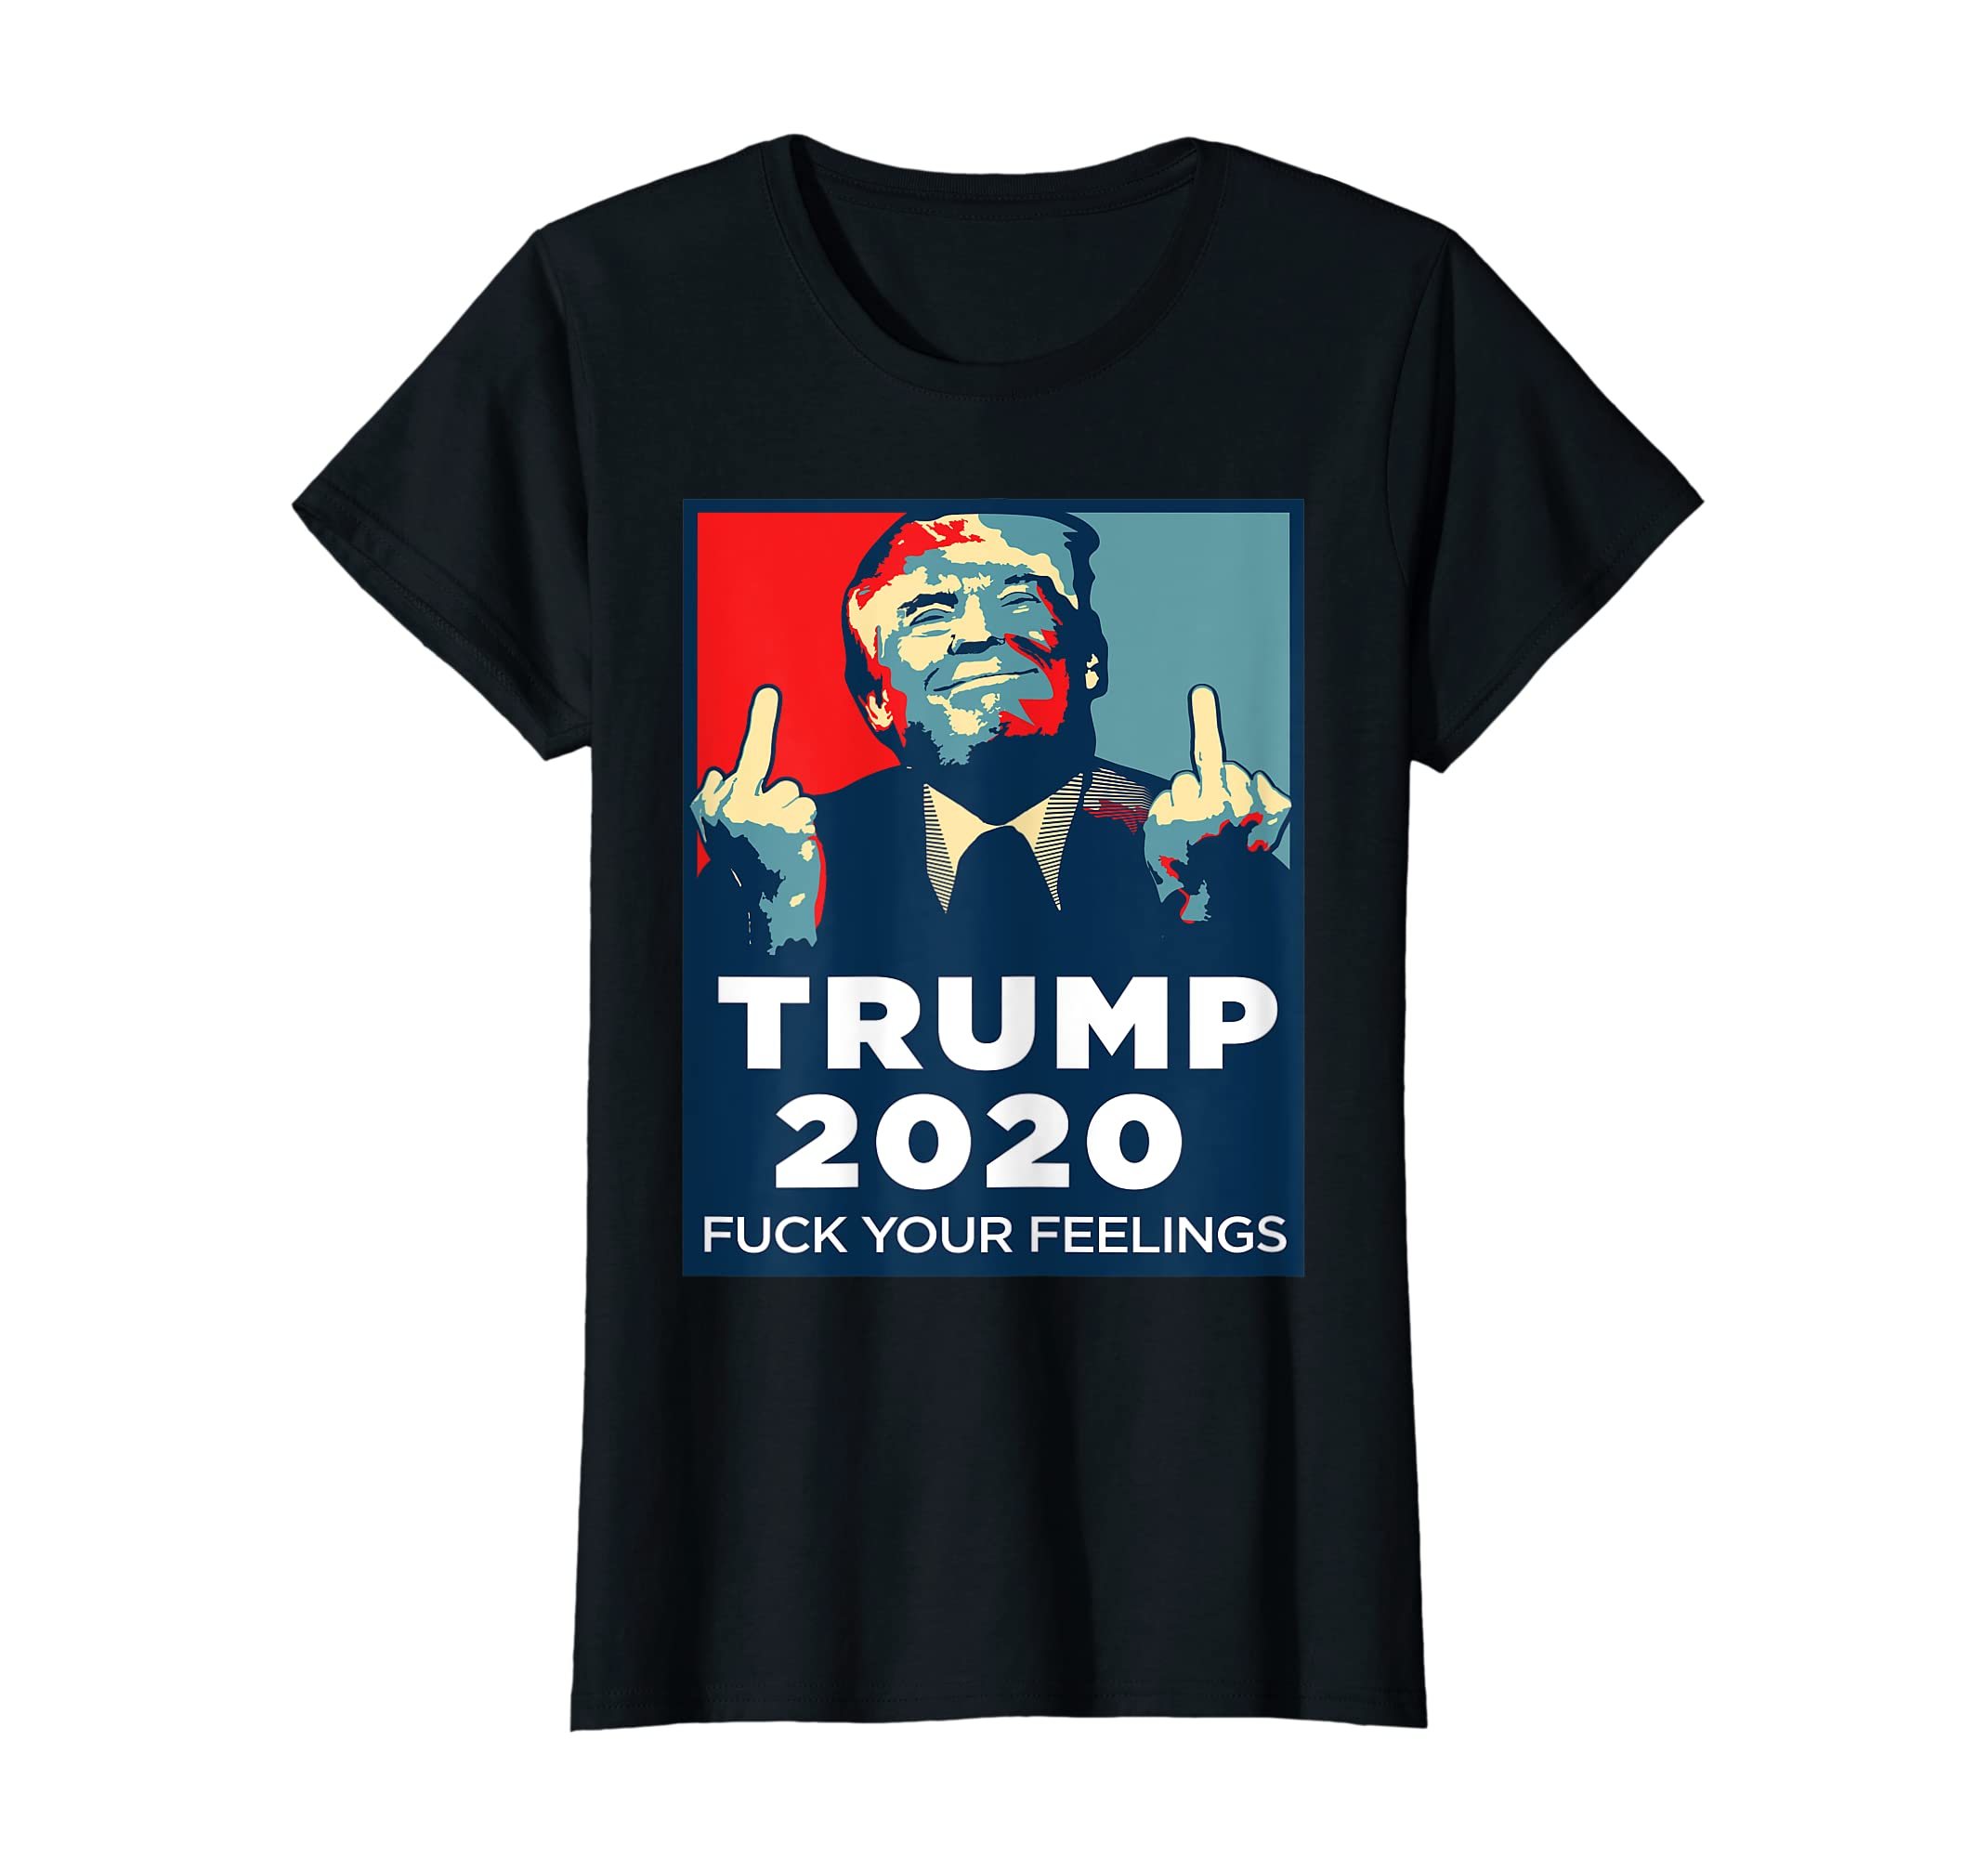 033fdb6a Amazon.com: Funny Trump 2020 FUCK Your Feelings Shirt: Clothing